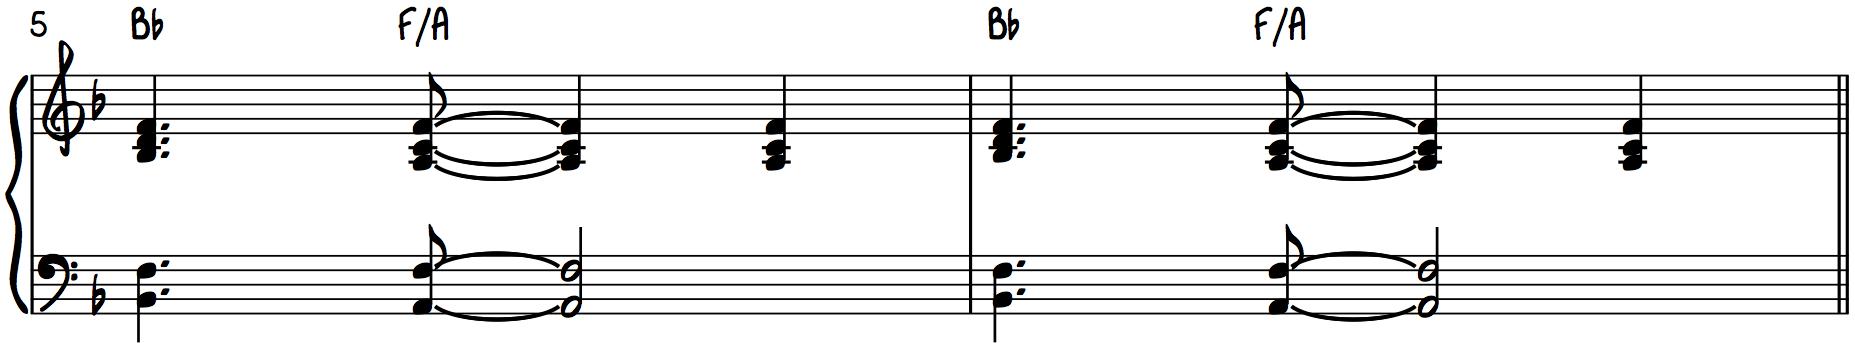 Step 1 Pro Piano Accompaniment Use Chord Inversions I6 First Inversion I63 Tonic6 Tonic63